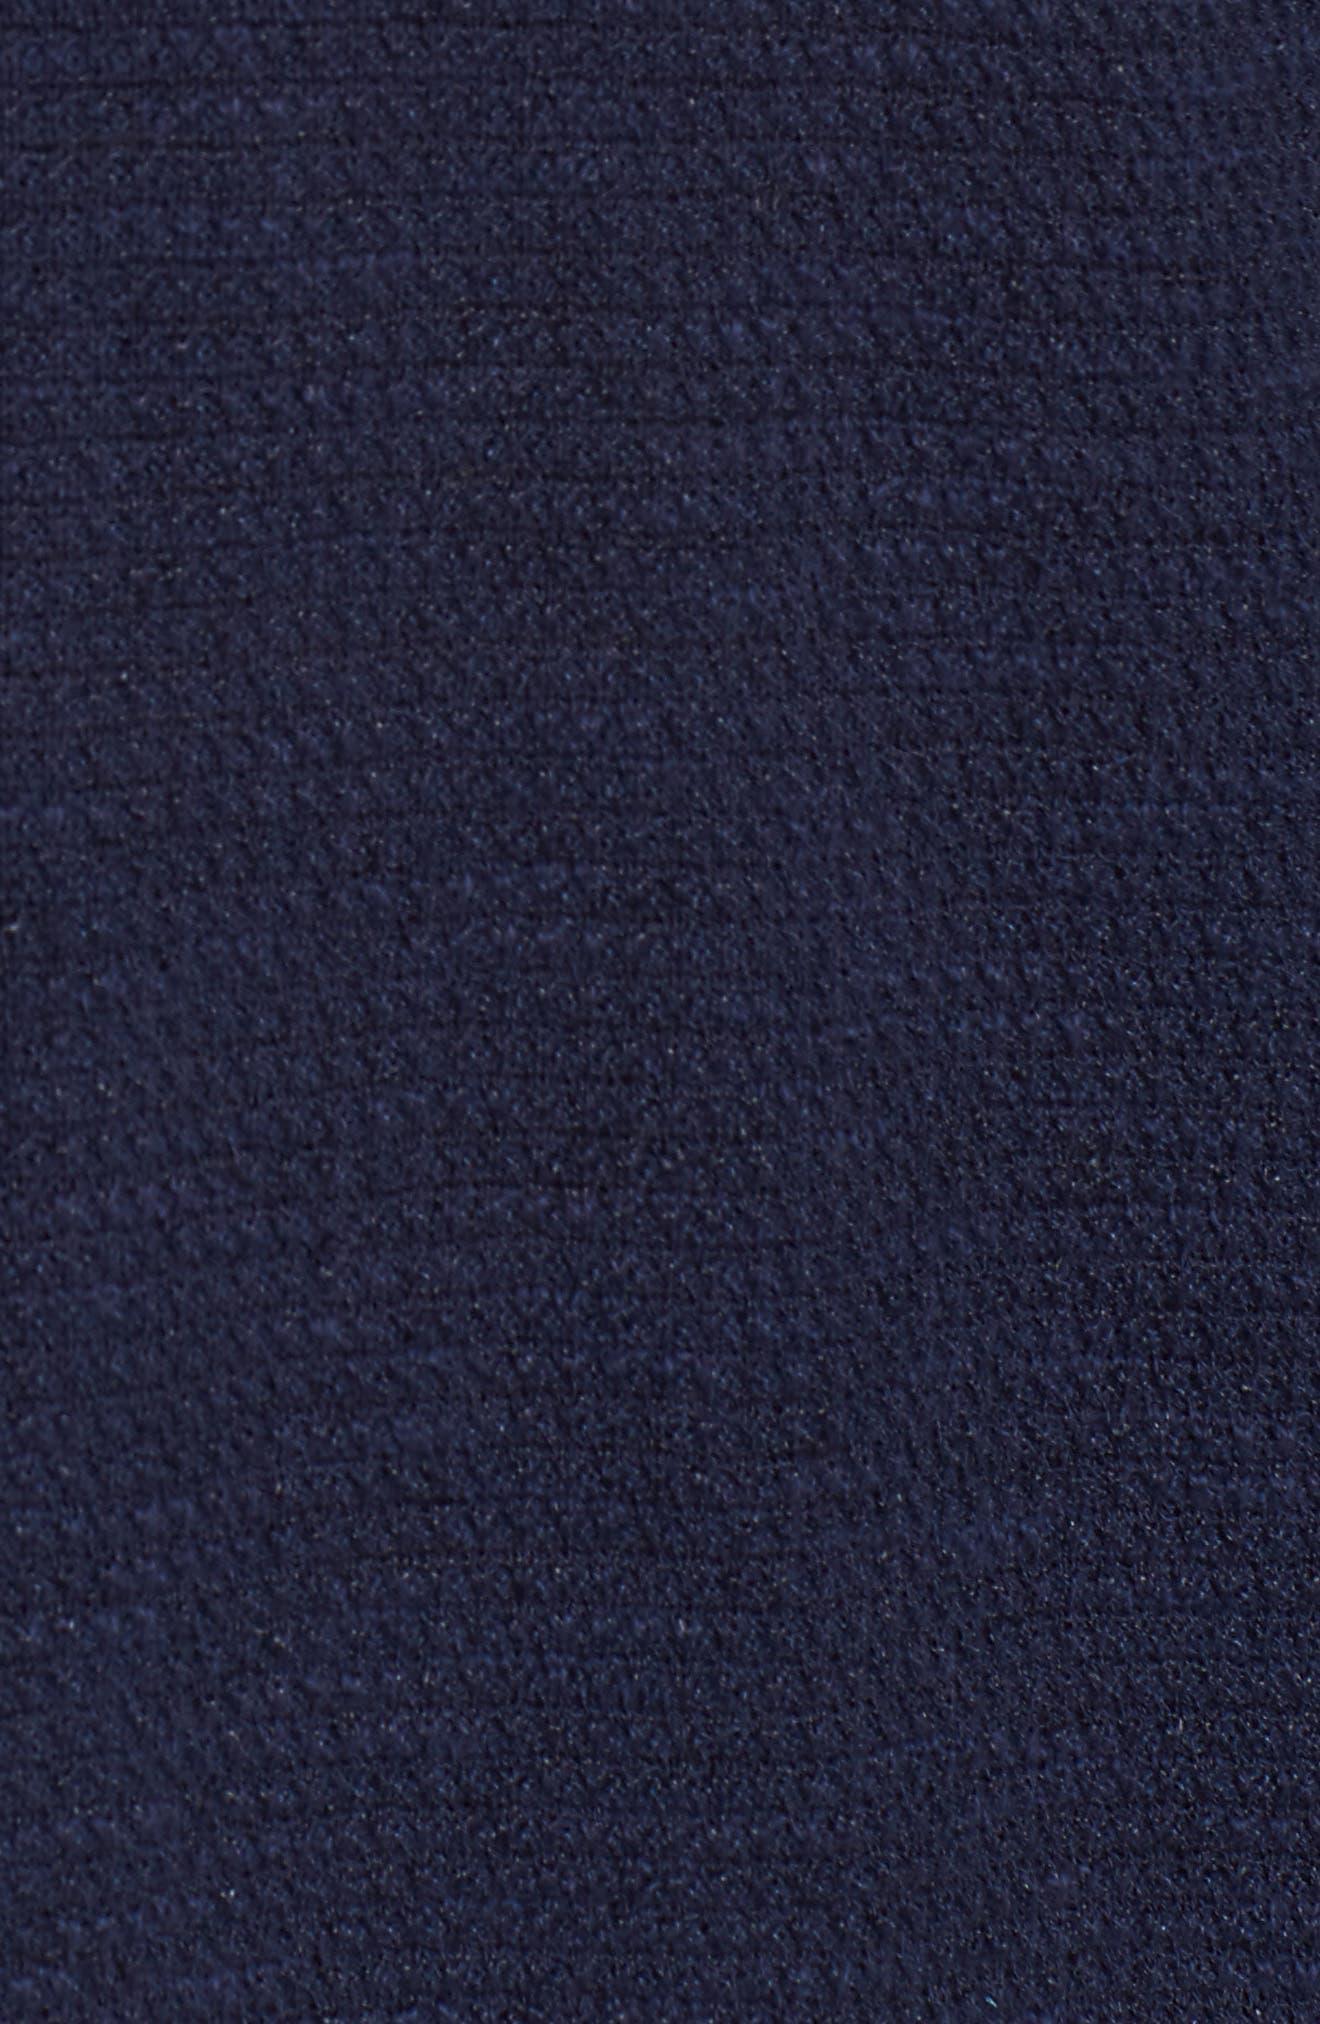 Drawstring Neck Organic Linen & Cotton Top,                             Alternate thumbnail 15, color,